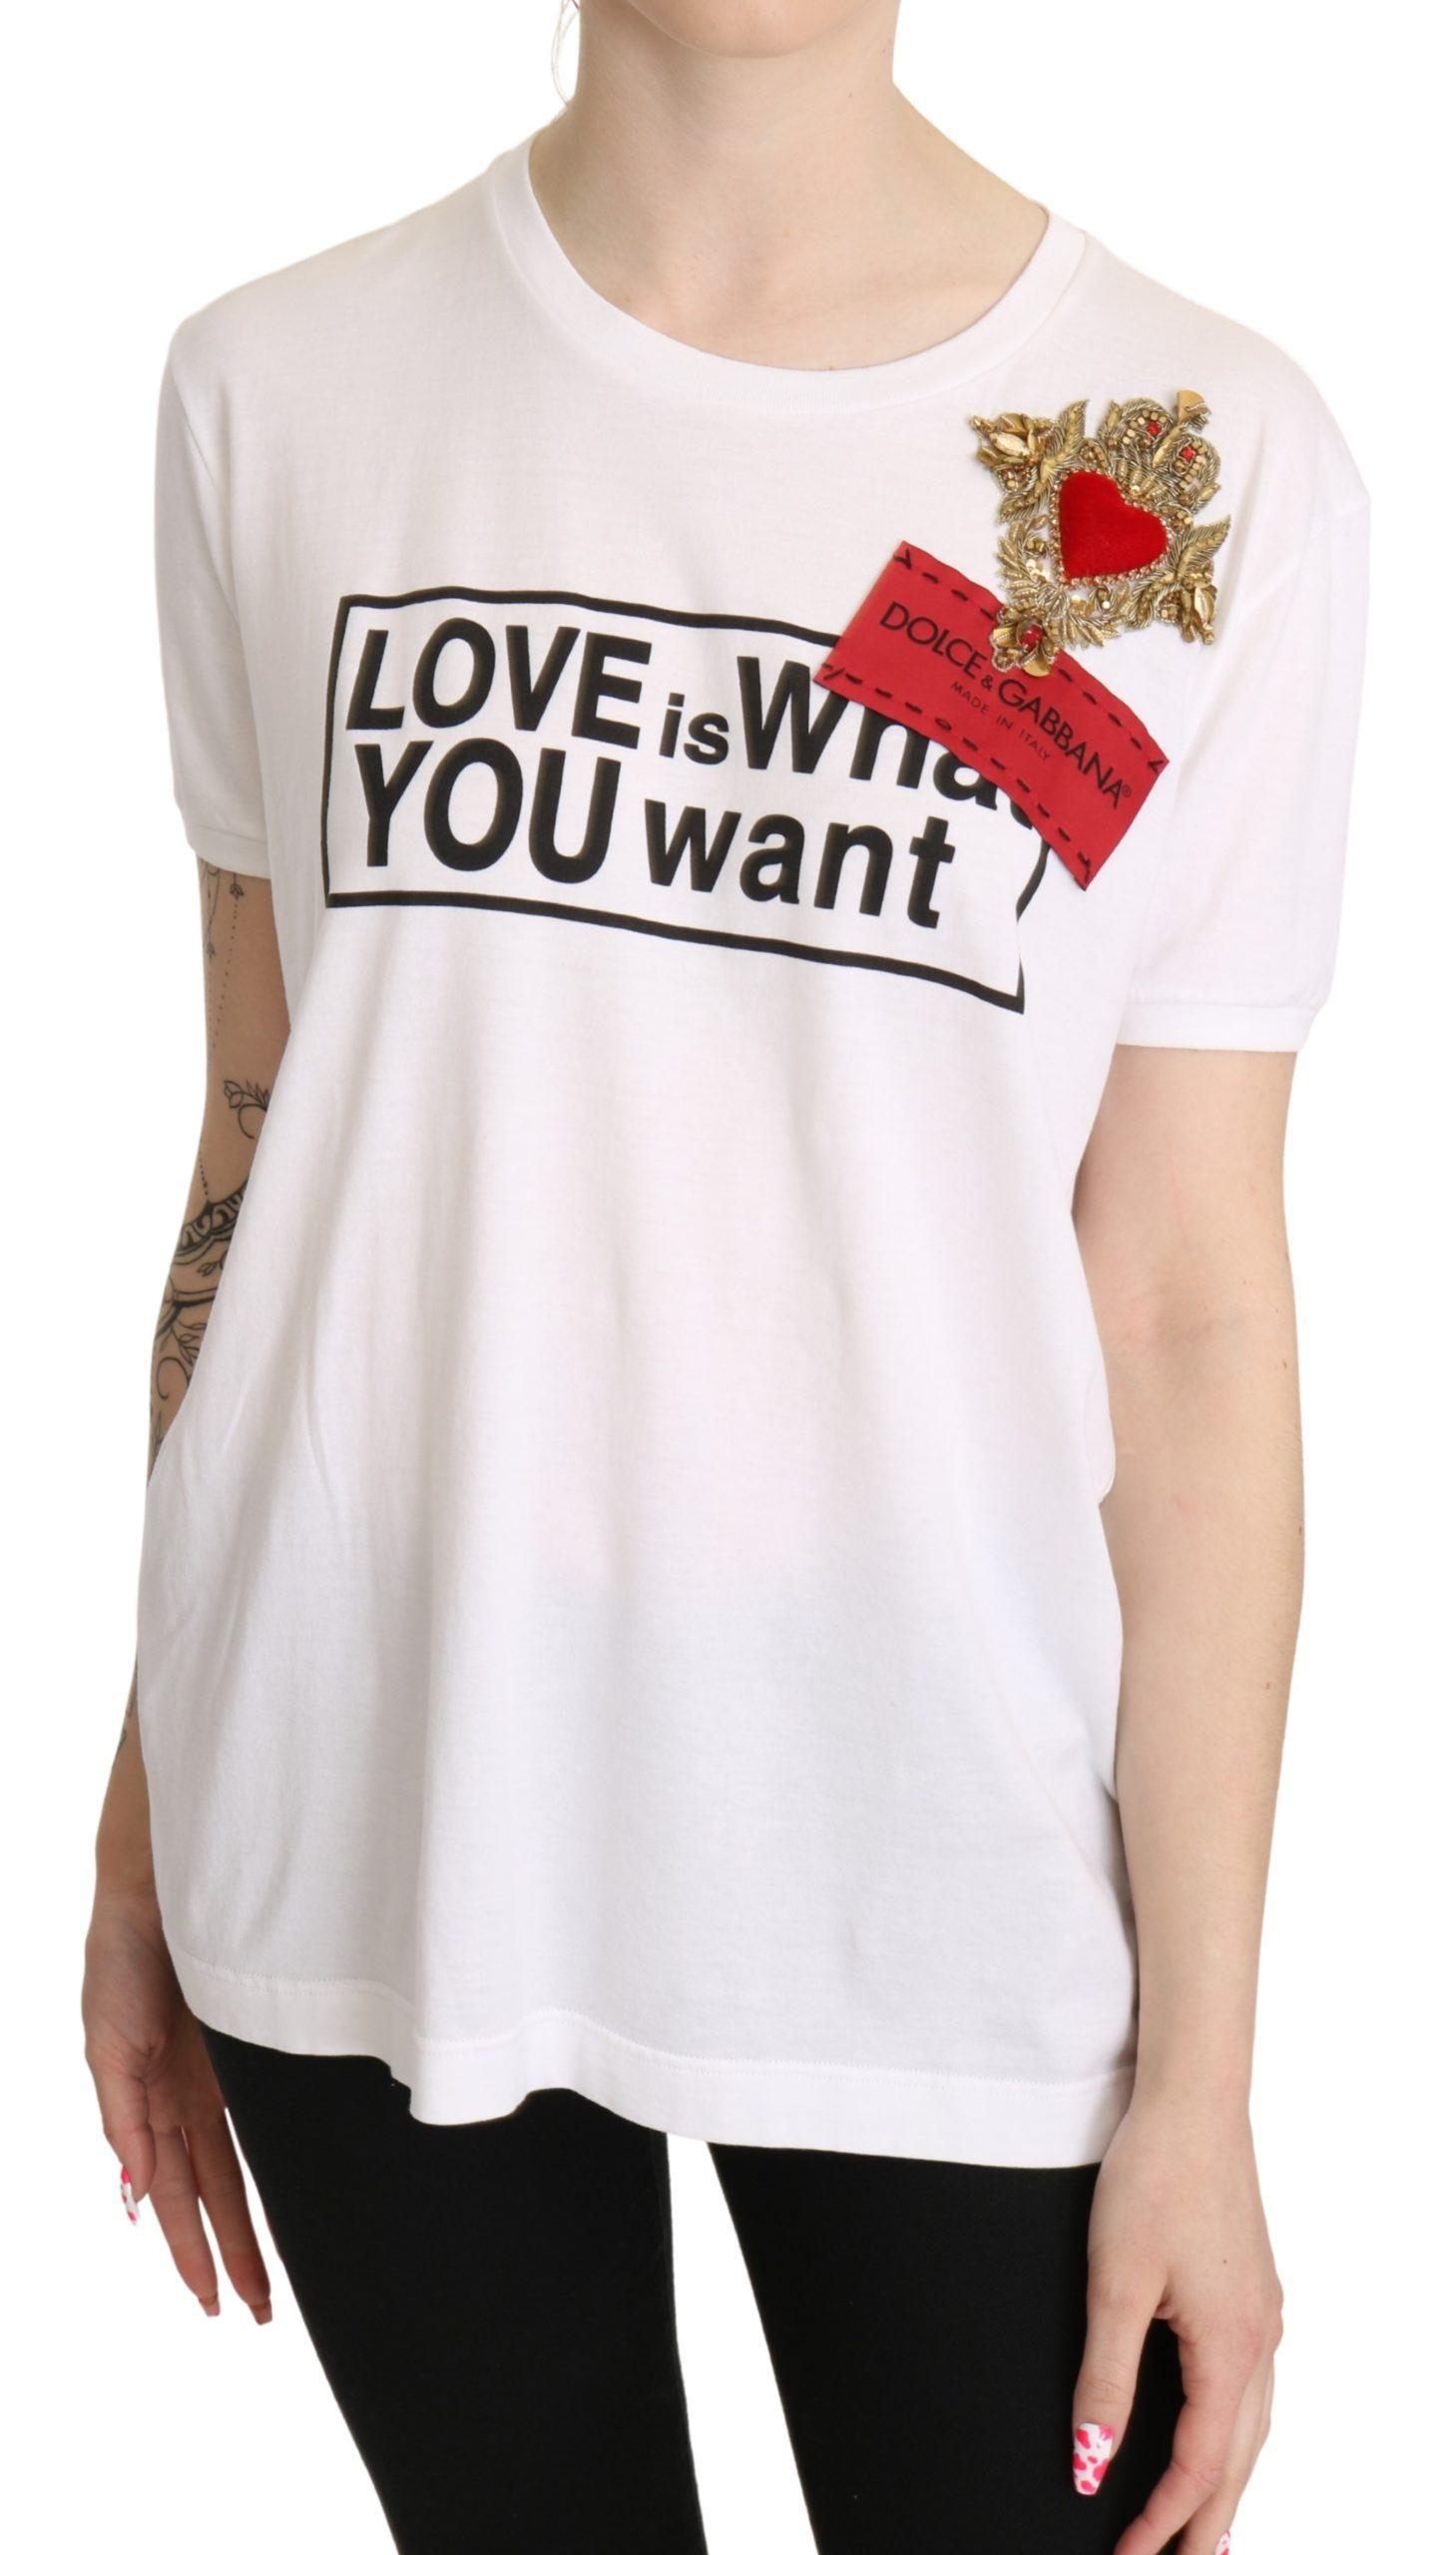 Dolce & Gabbana Women's Heart Cotton Casual Top White TSH5267 - IT40|S